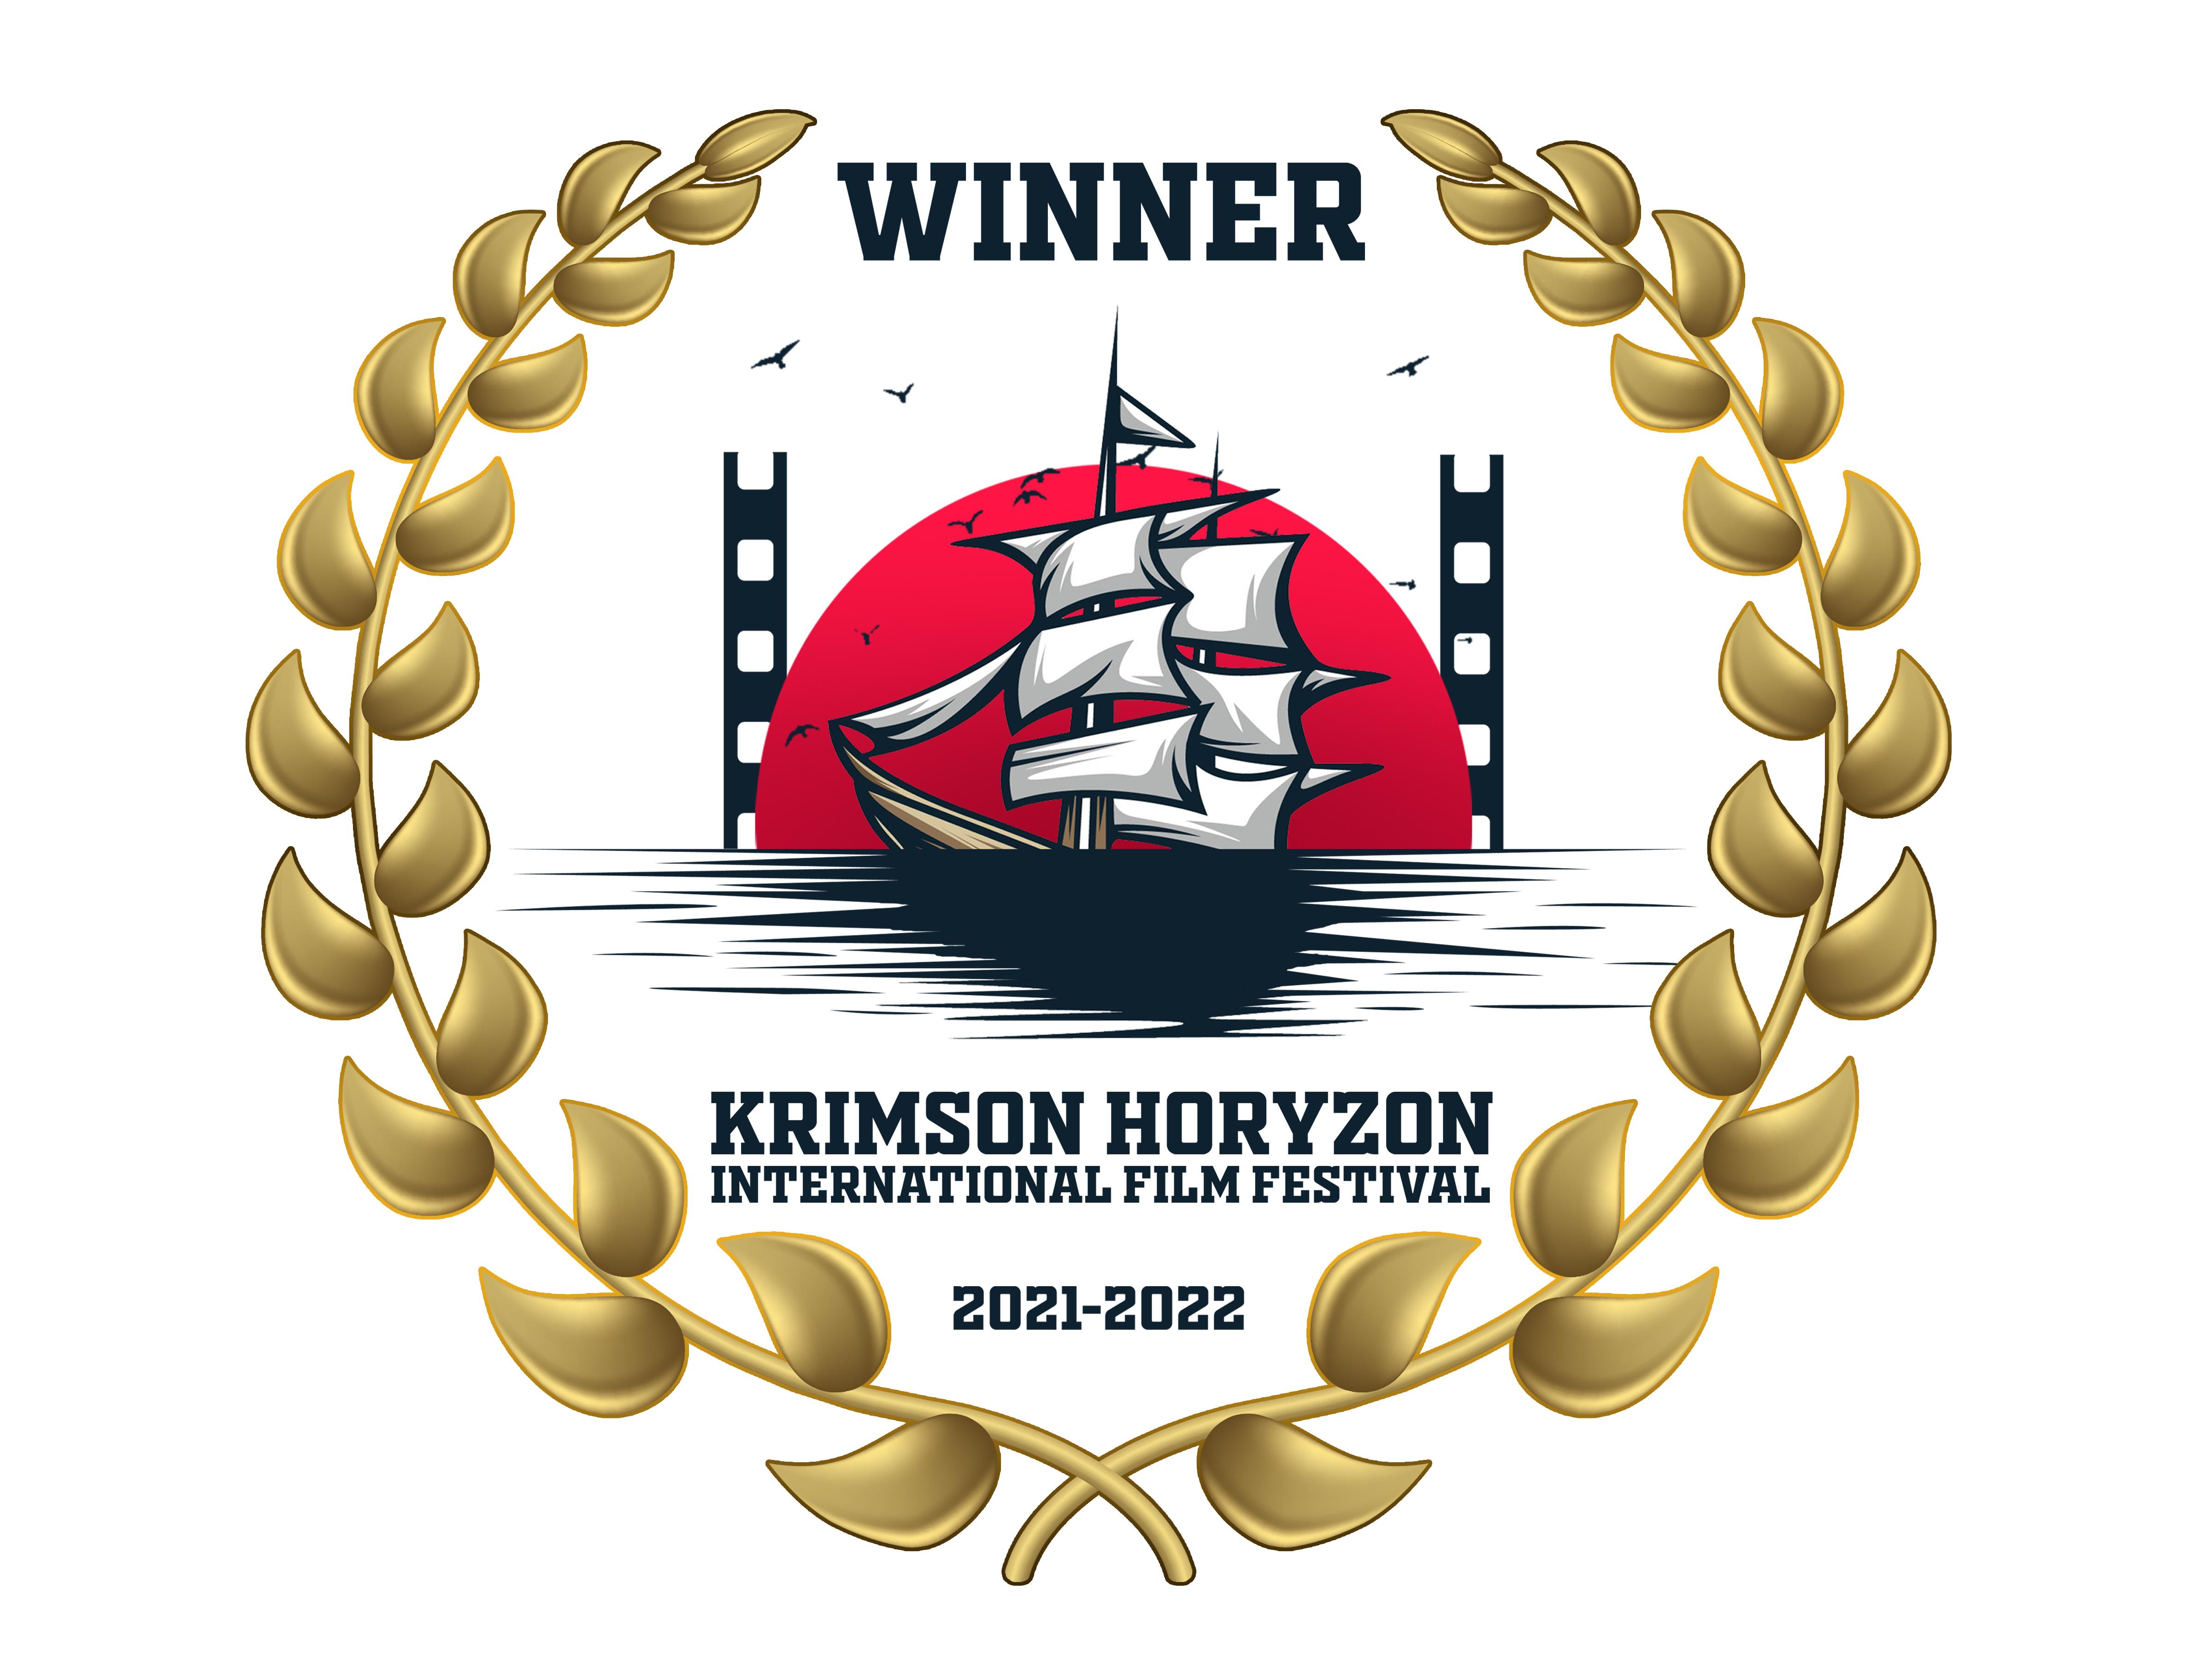 KrimsonHoryzenIntlFilmFestival - Best Women's Film